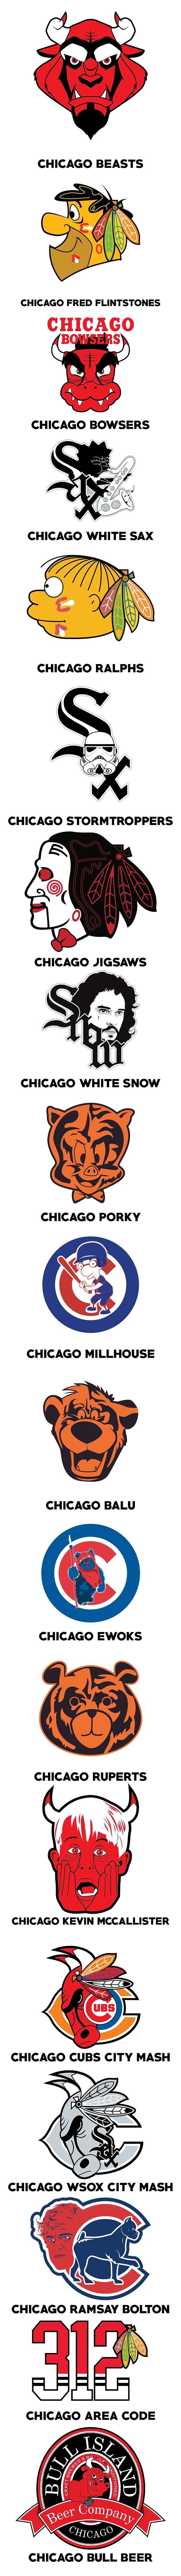 ALL_MASHUPS_CHICAGO.jpg